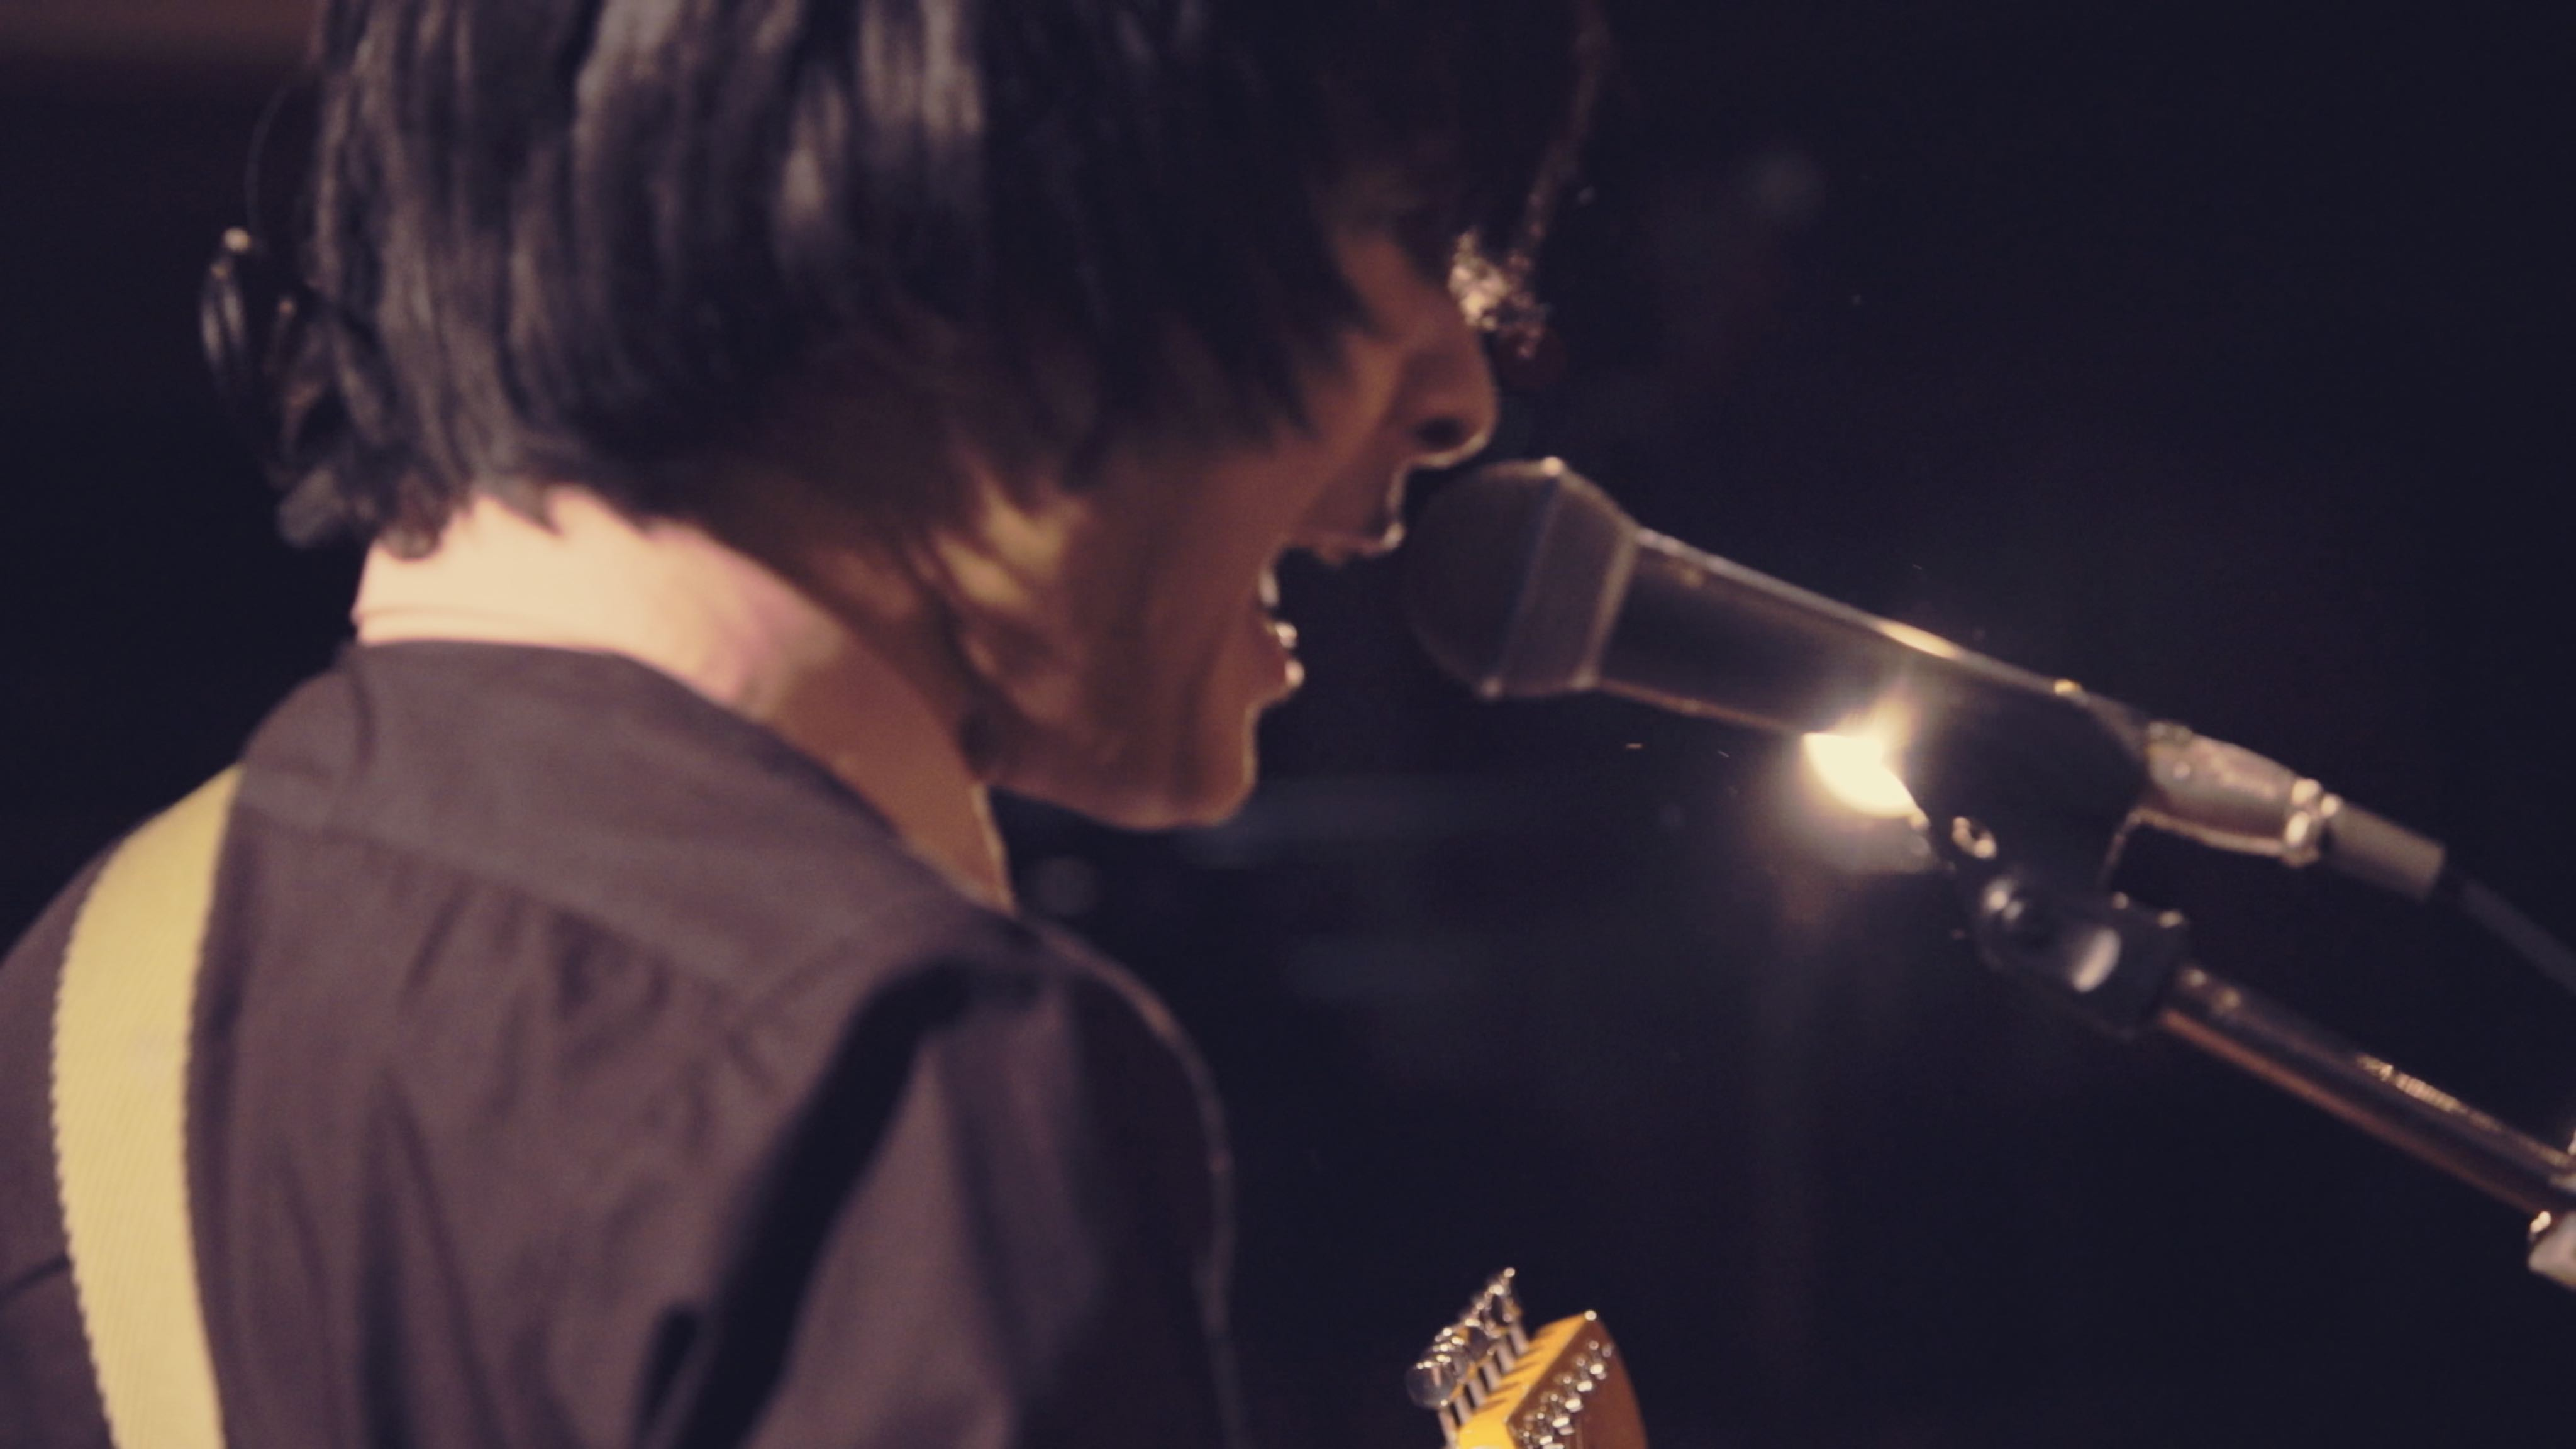 UNISON SQUARE GARDEN-STUDIO LIVE at Victor Studio 302